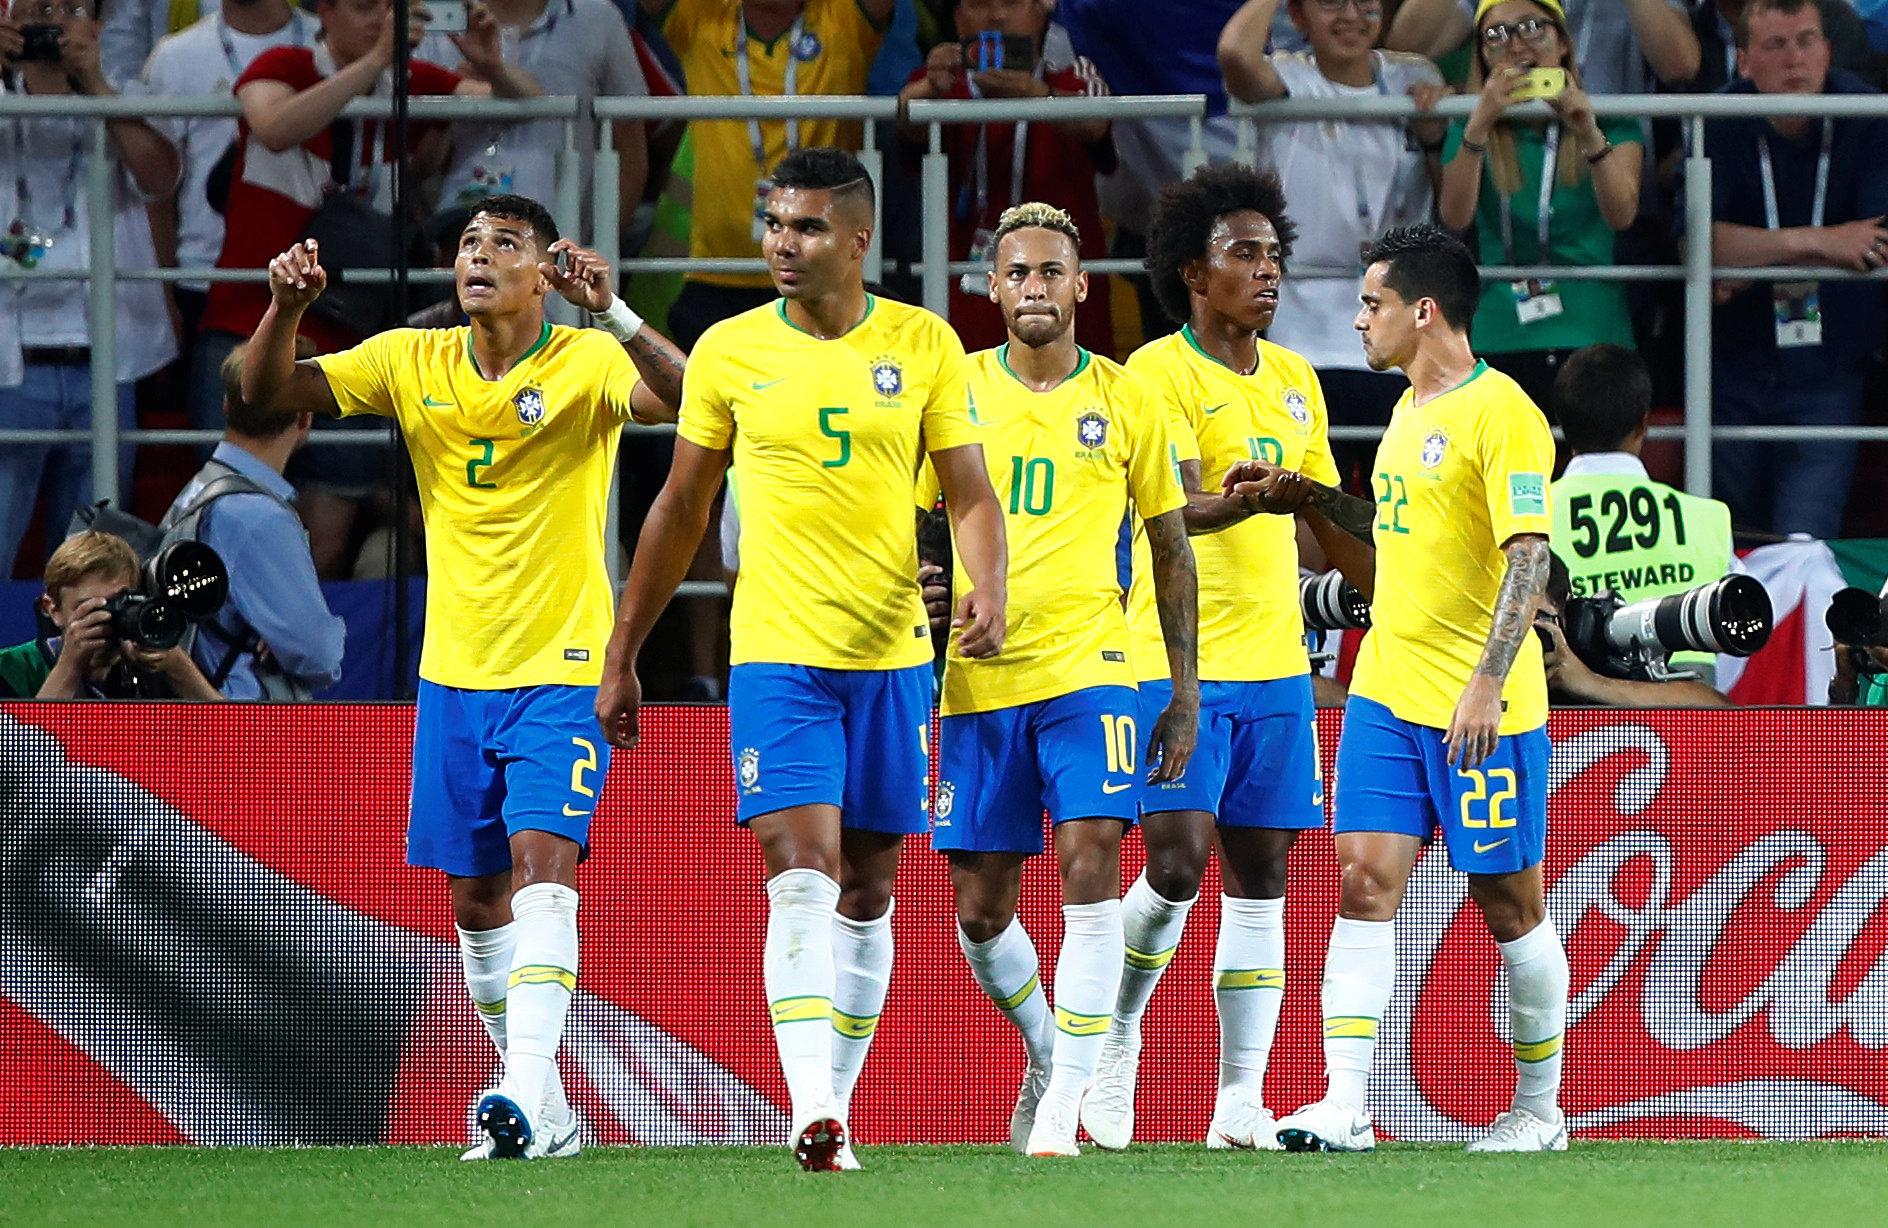 Brasil eliminó a México y los memes se ensañaron con Neymar